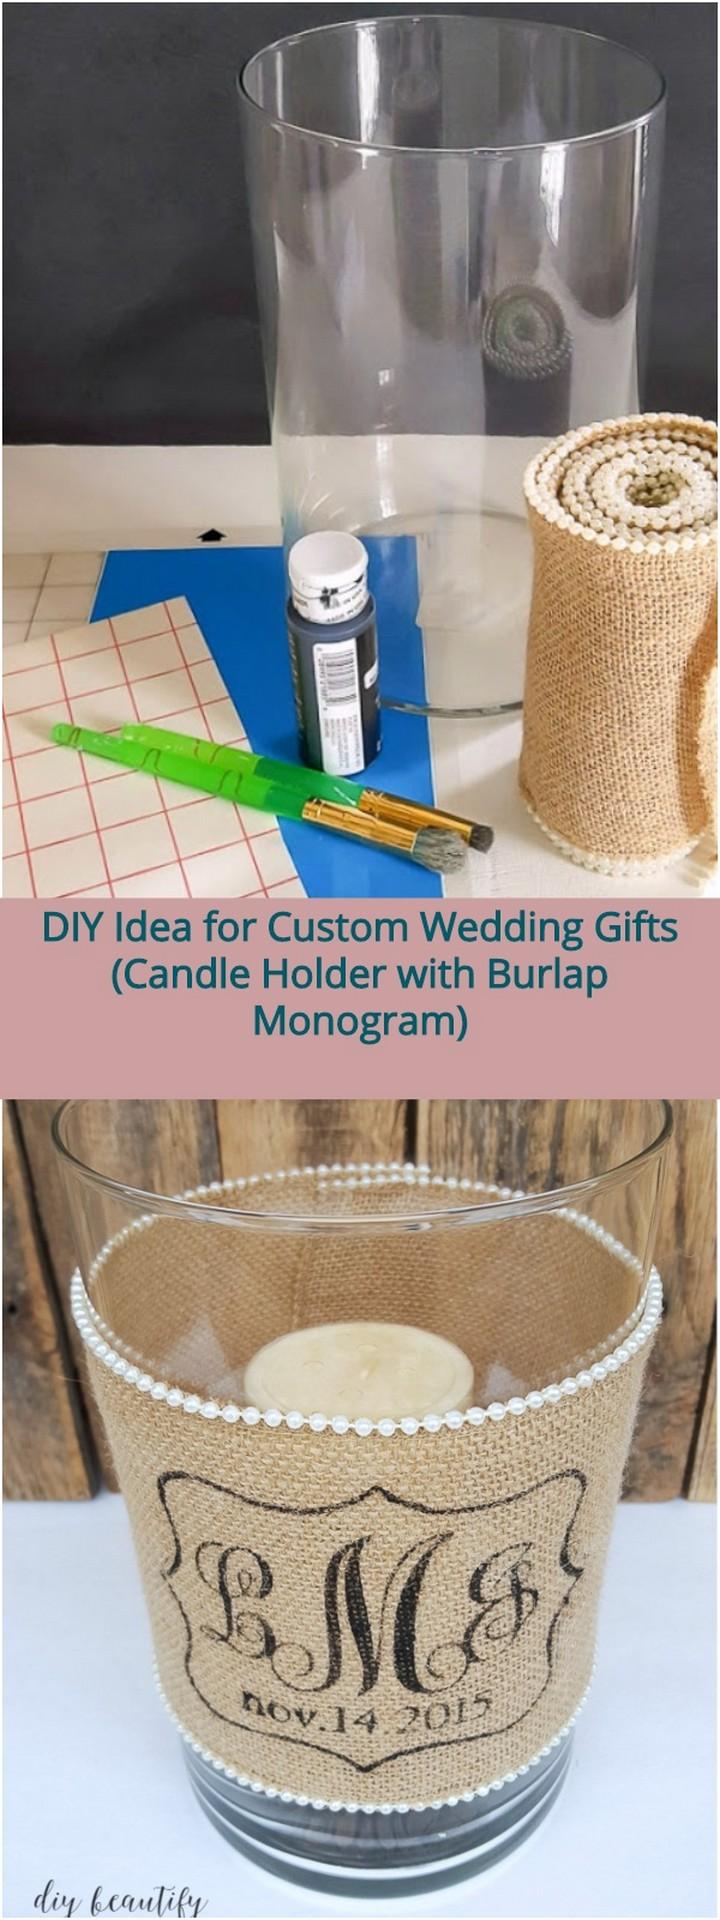 DIY Idea for Custom Wedding Gifts Candle Holder with Burlap Monogram 1